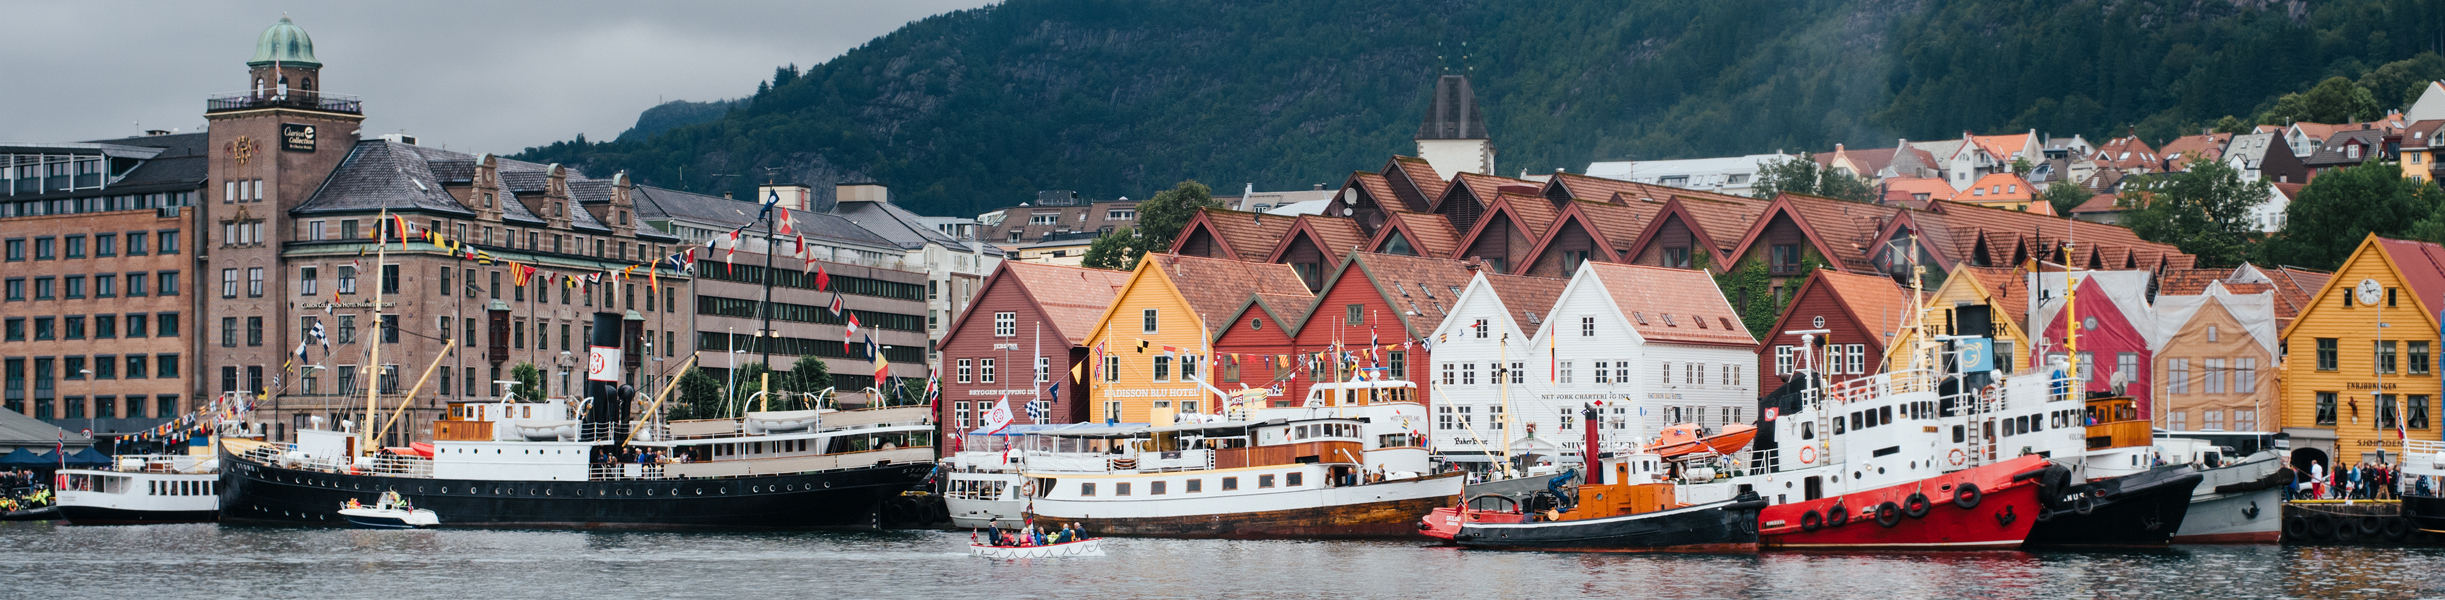 Bergen_banner2.jpg